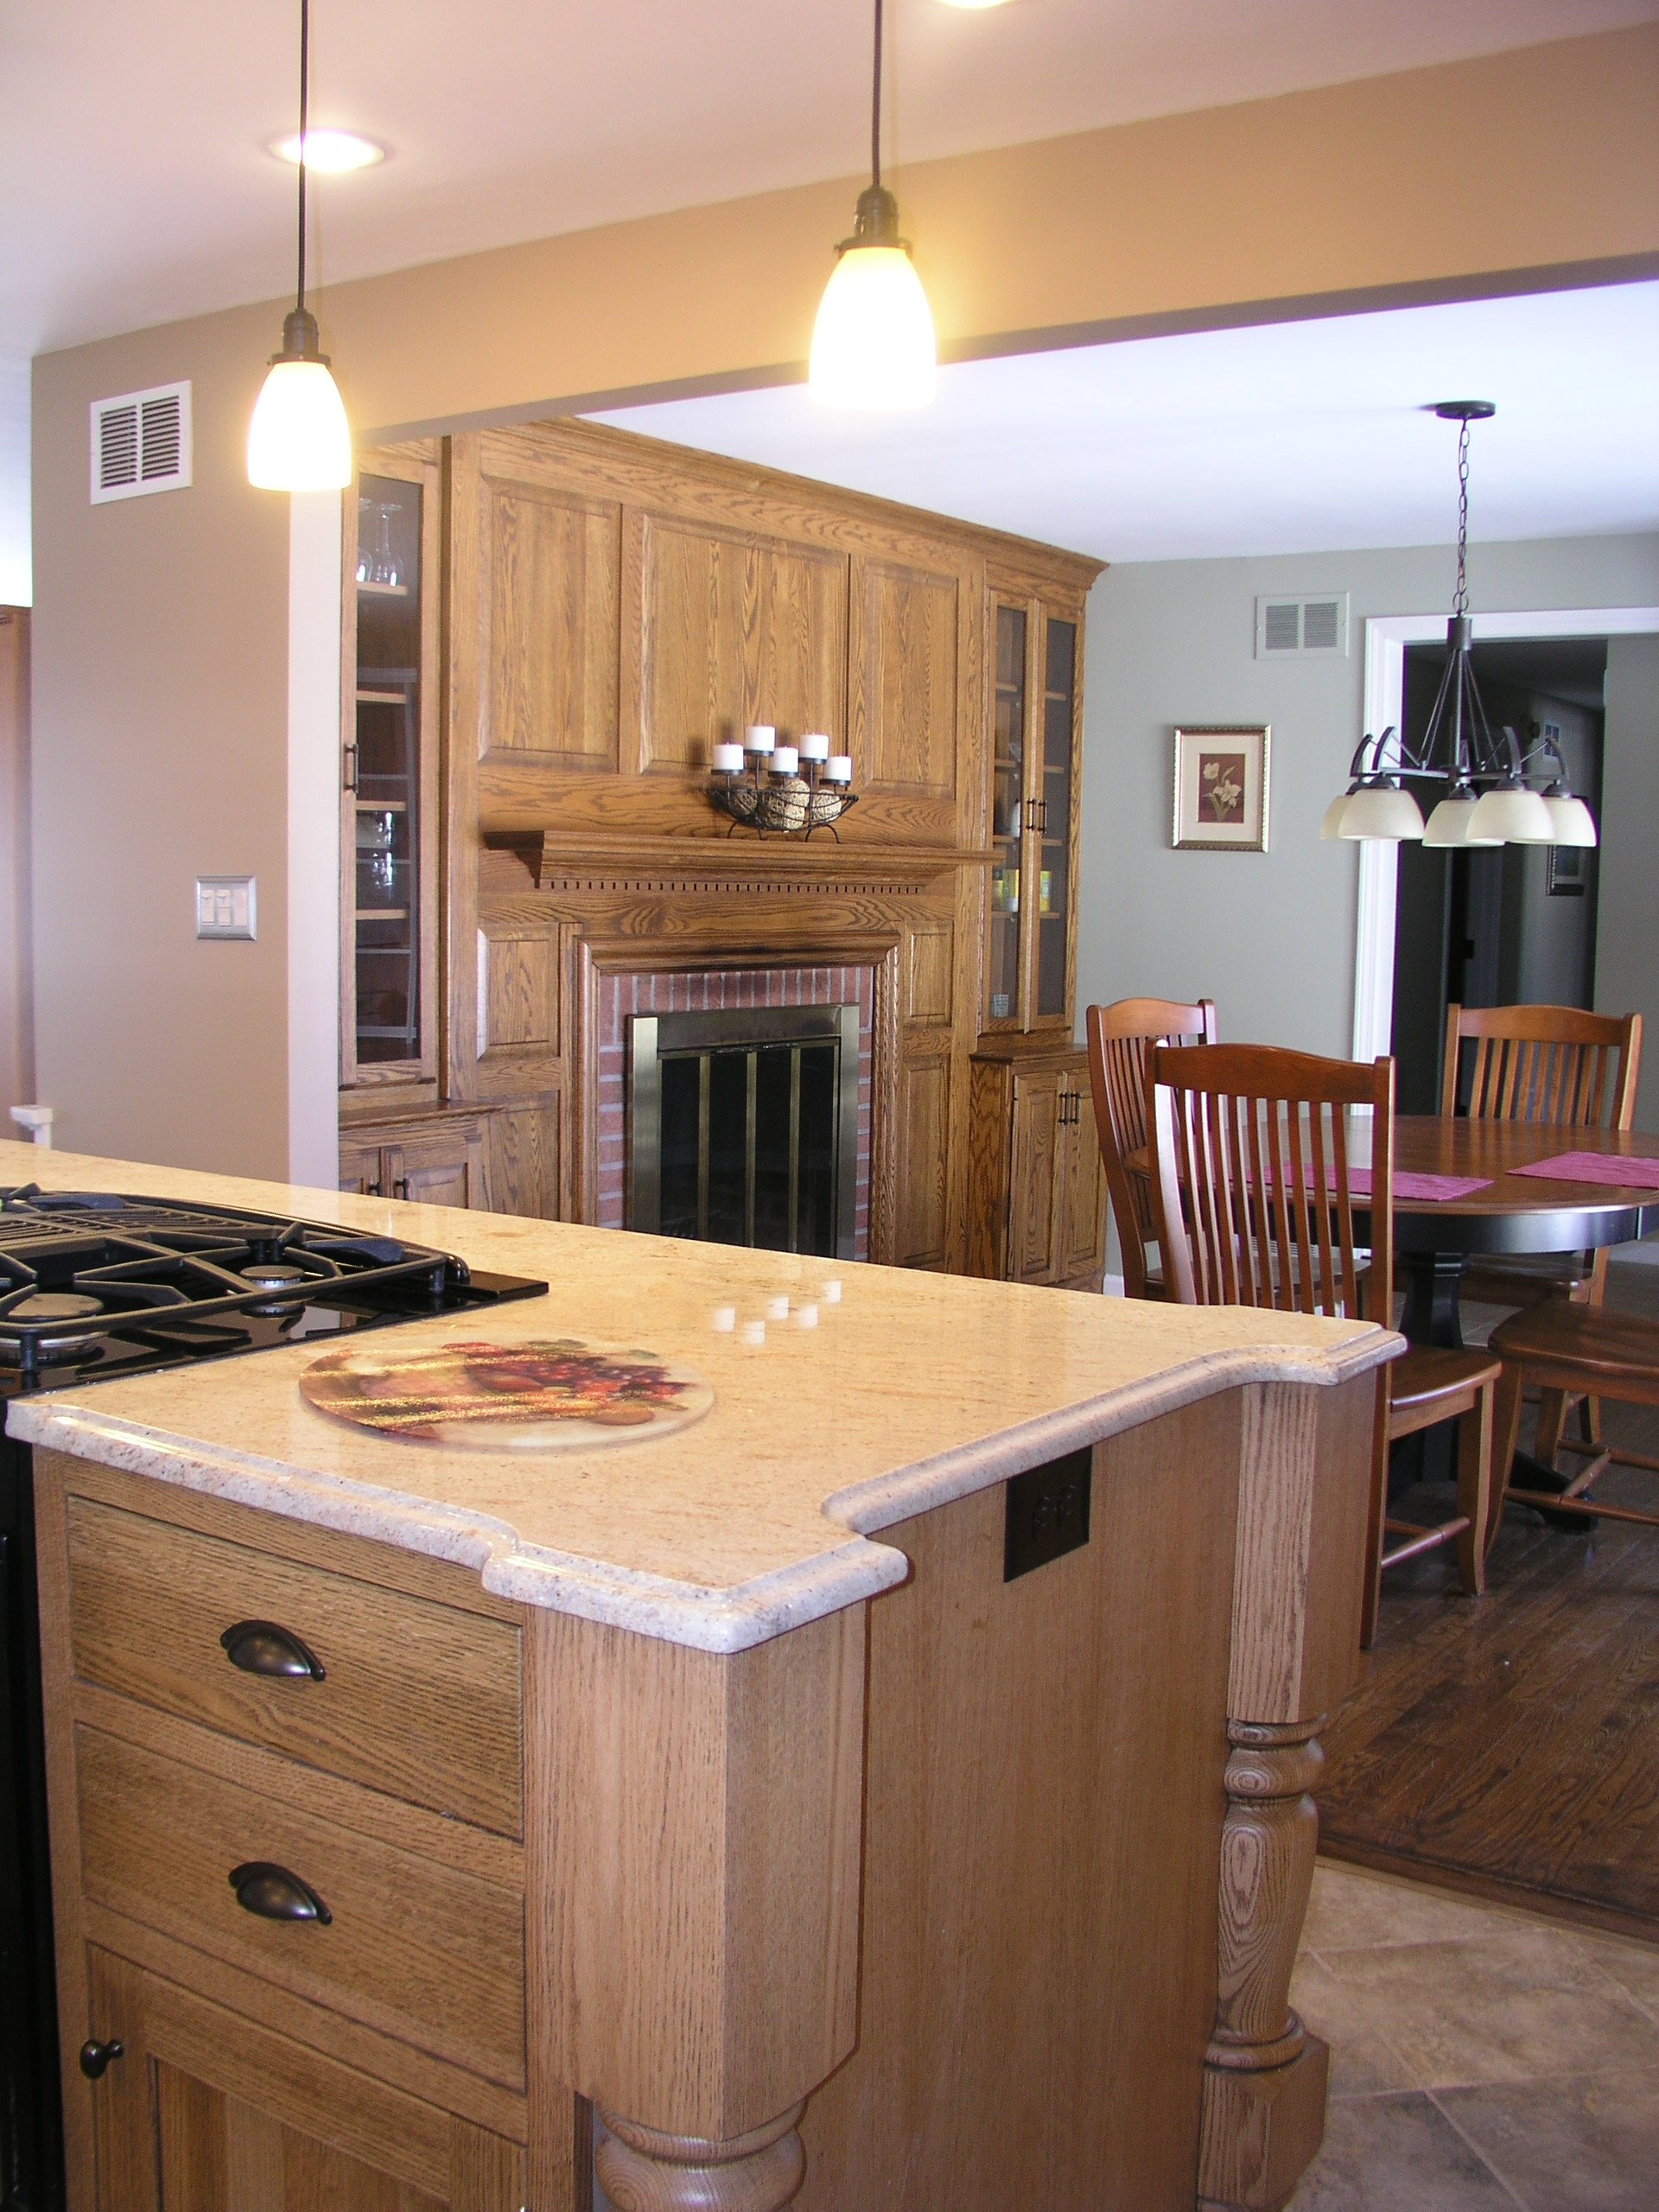 white shaker kitchen cabinets trash cans quarter sawn oak island | design center